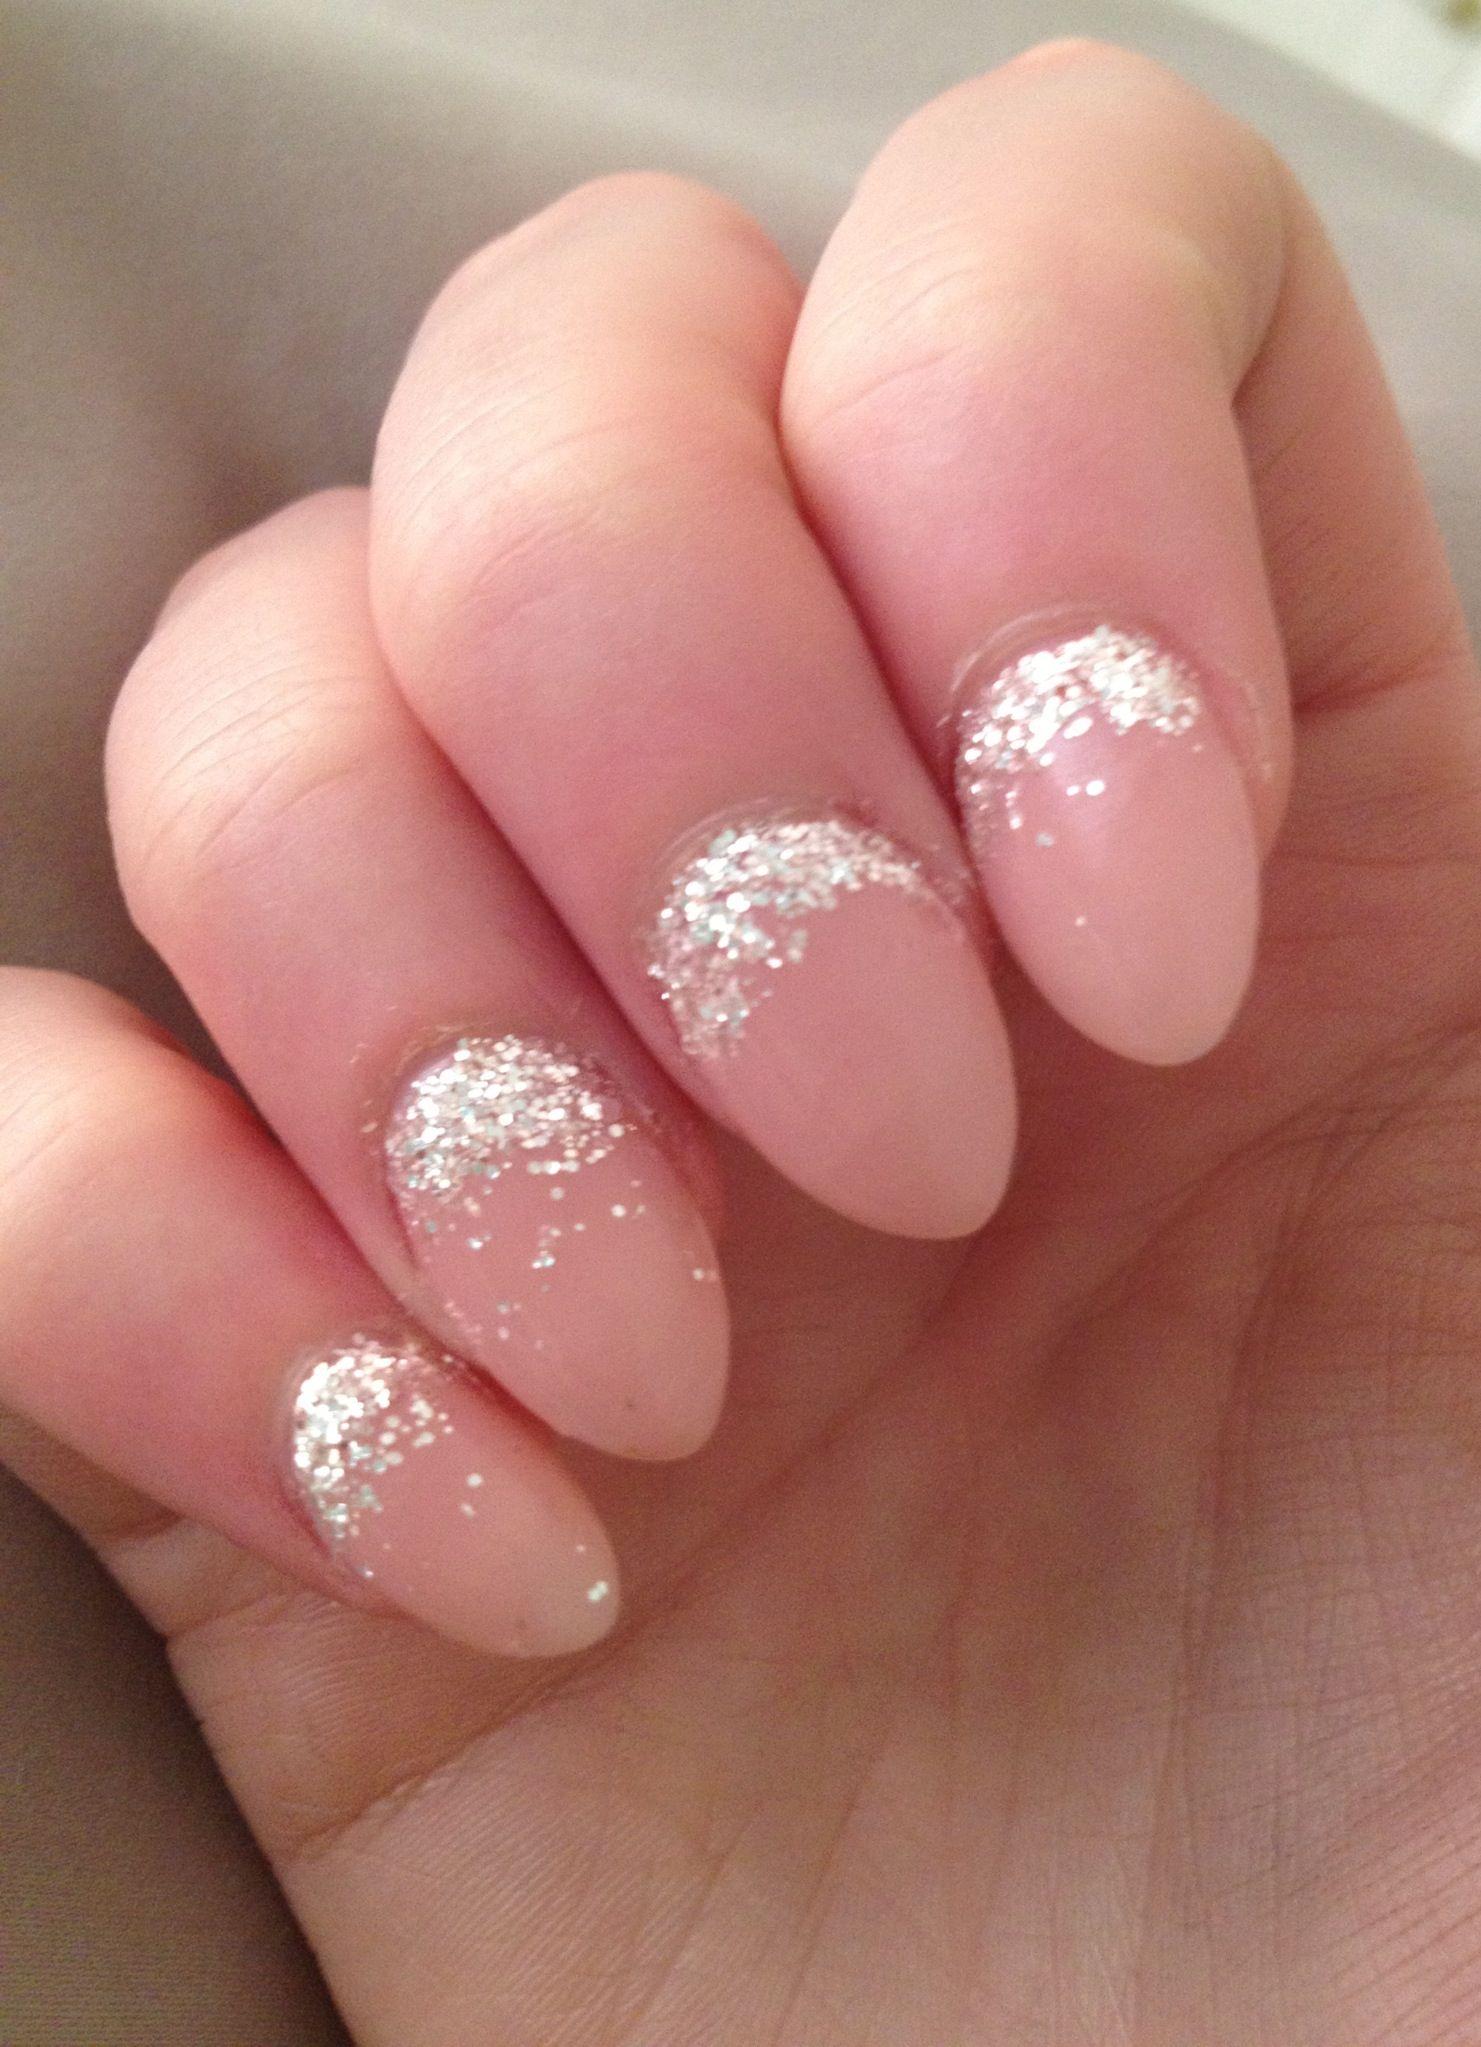 Glitter fade #nails   Nail Diaries   Pinterest   Glitter fade nails ...